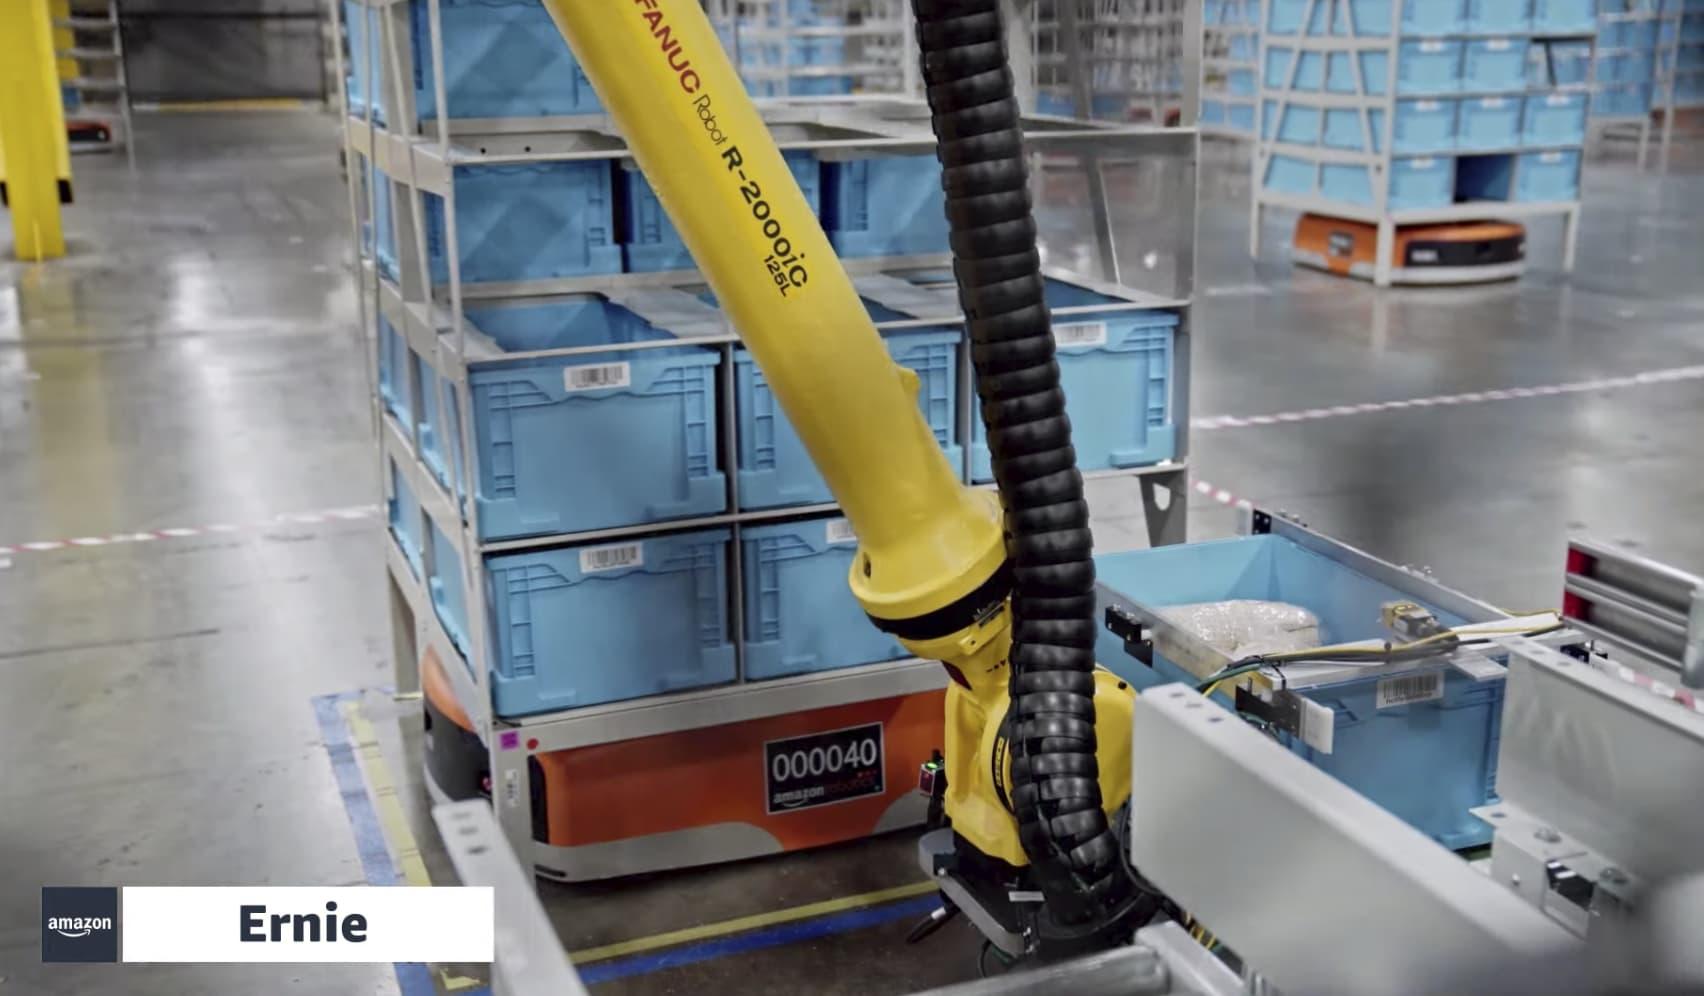 Amazon details new warehouse robots, 'Ernie' and 'Bert'